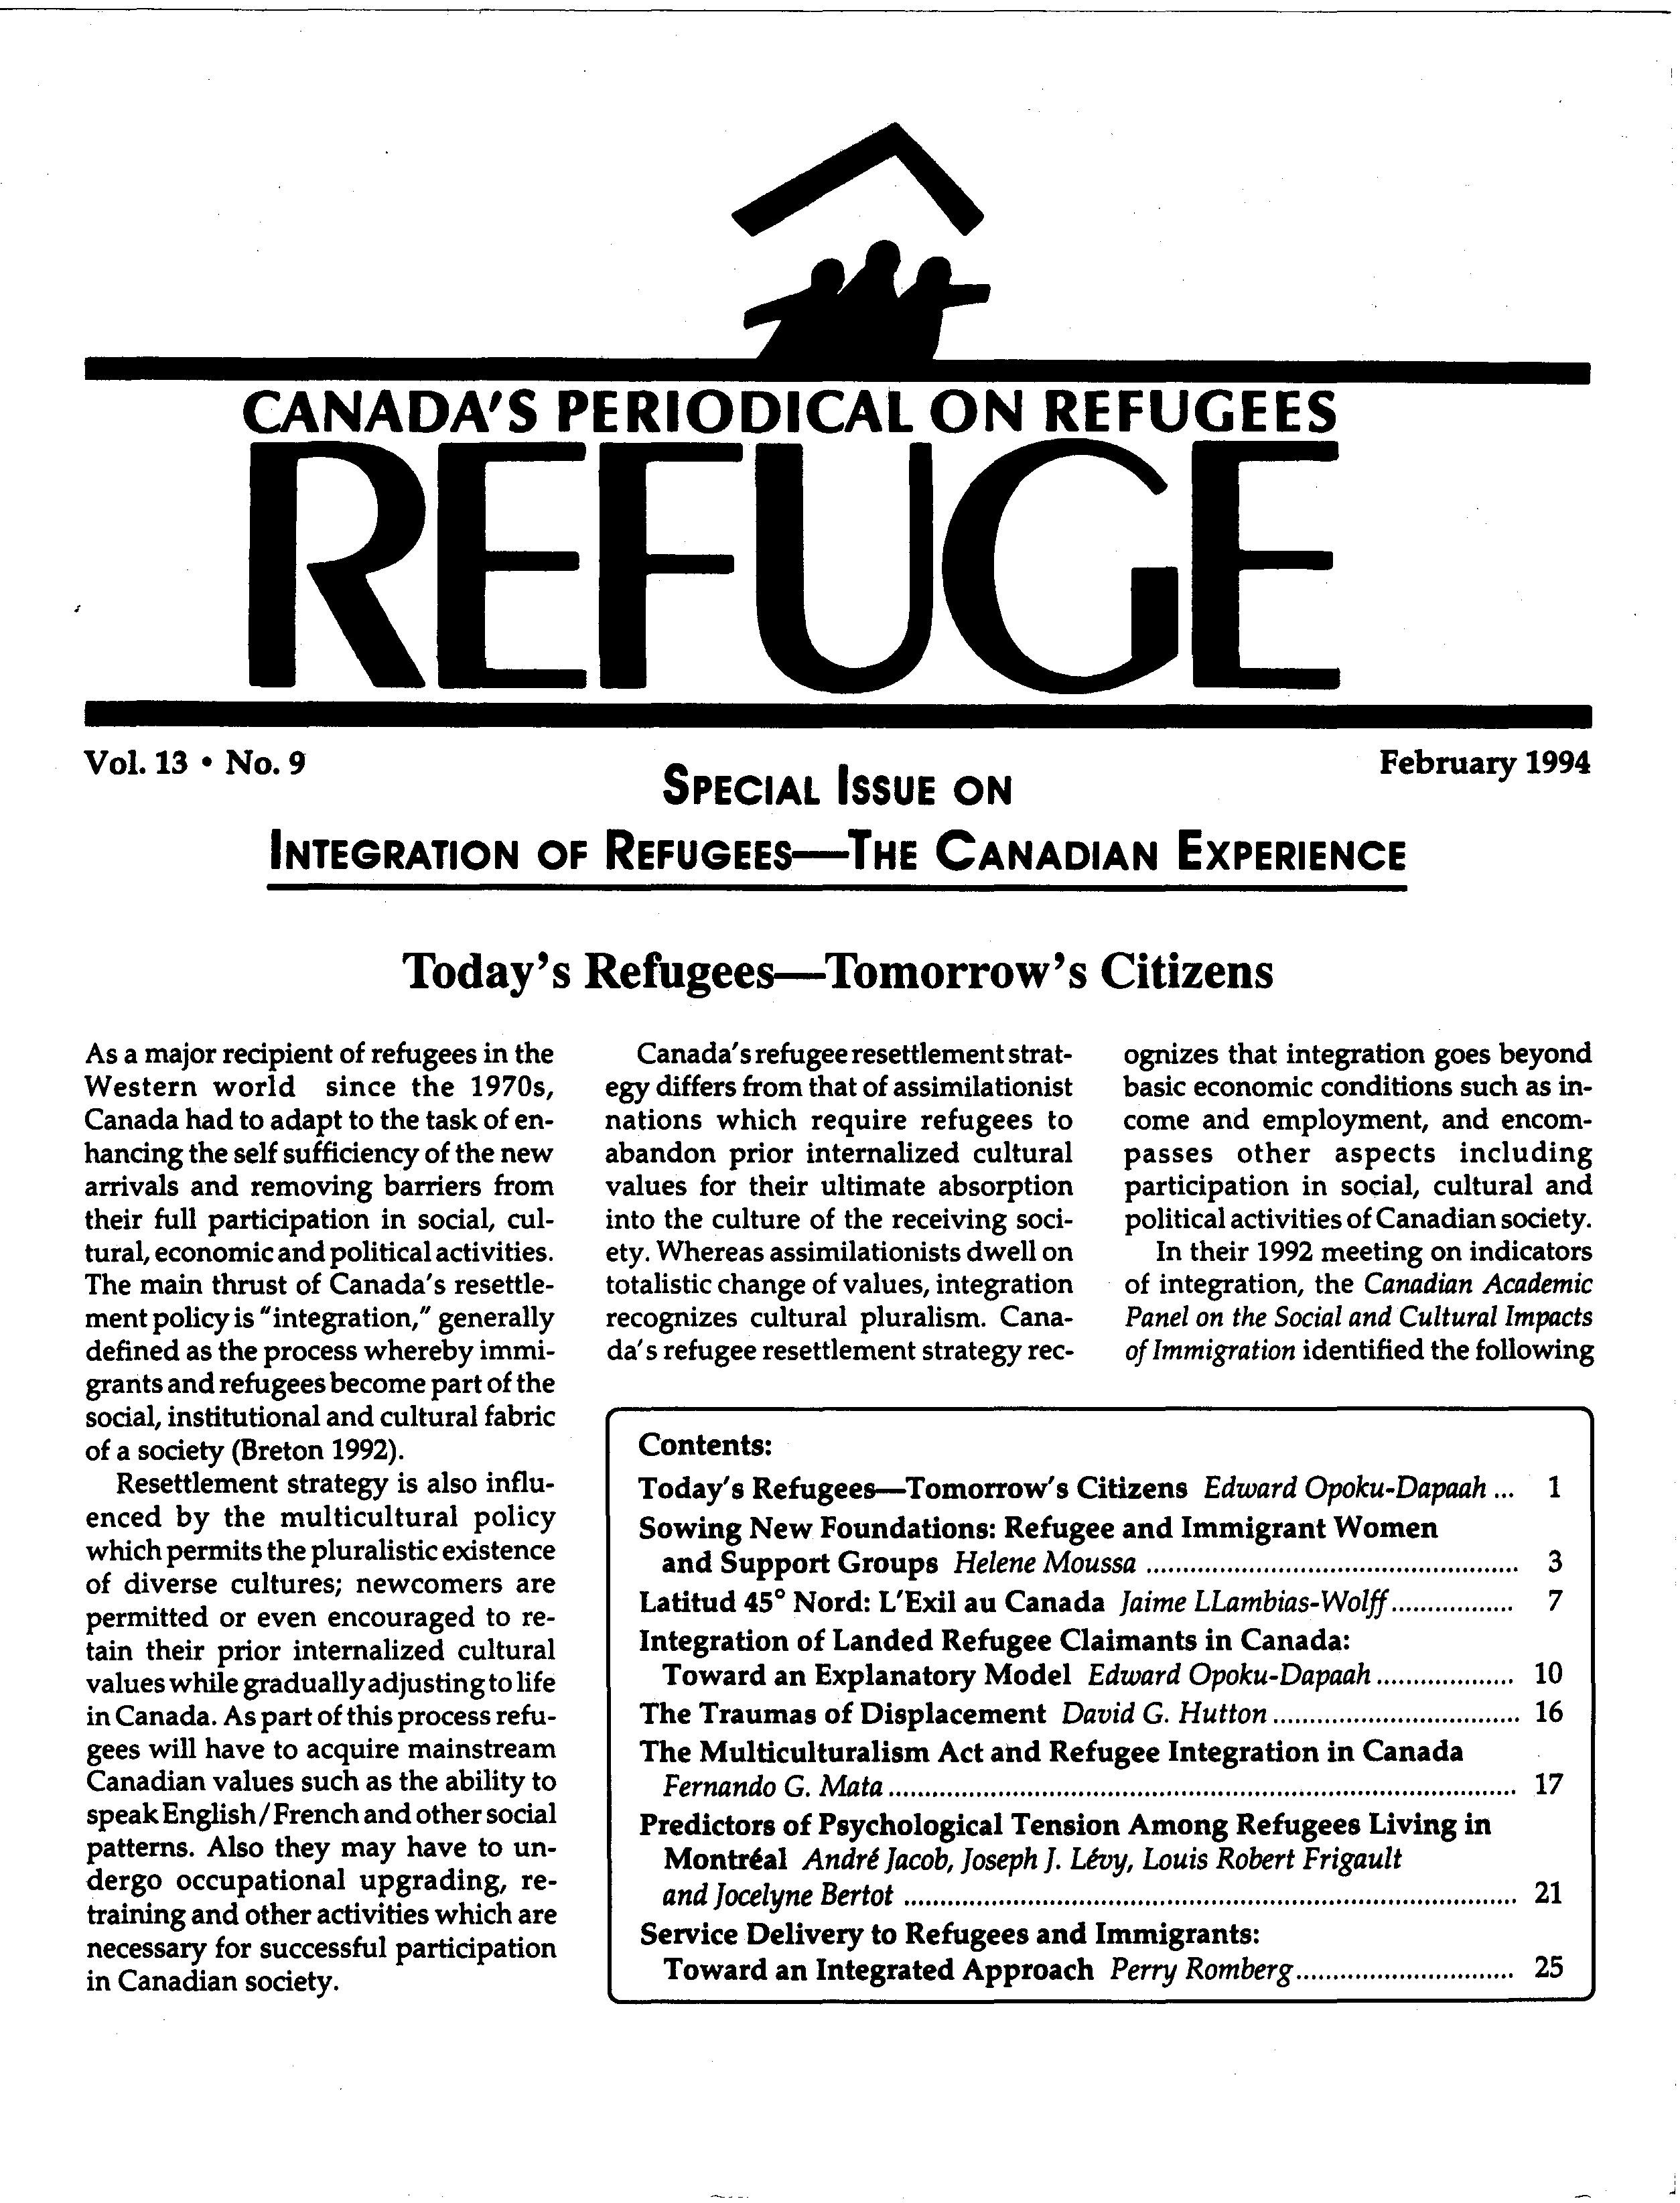 first page Refuge vol. 13.9 1994